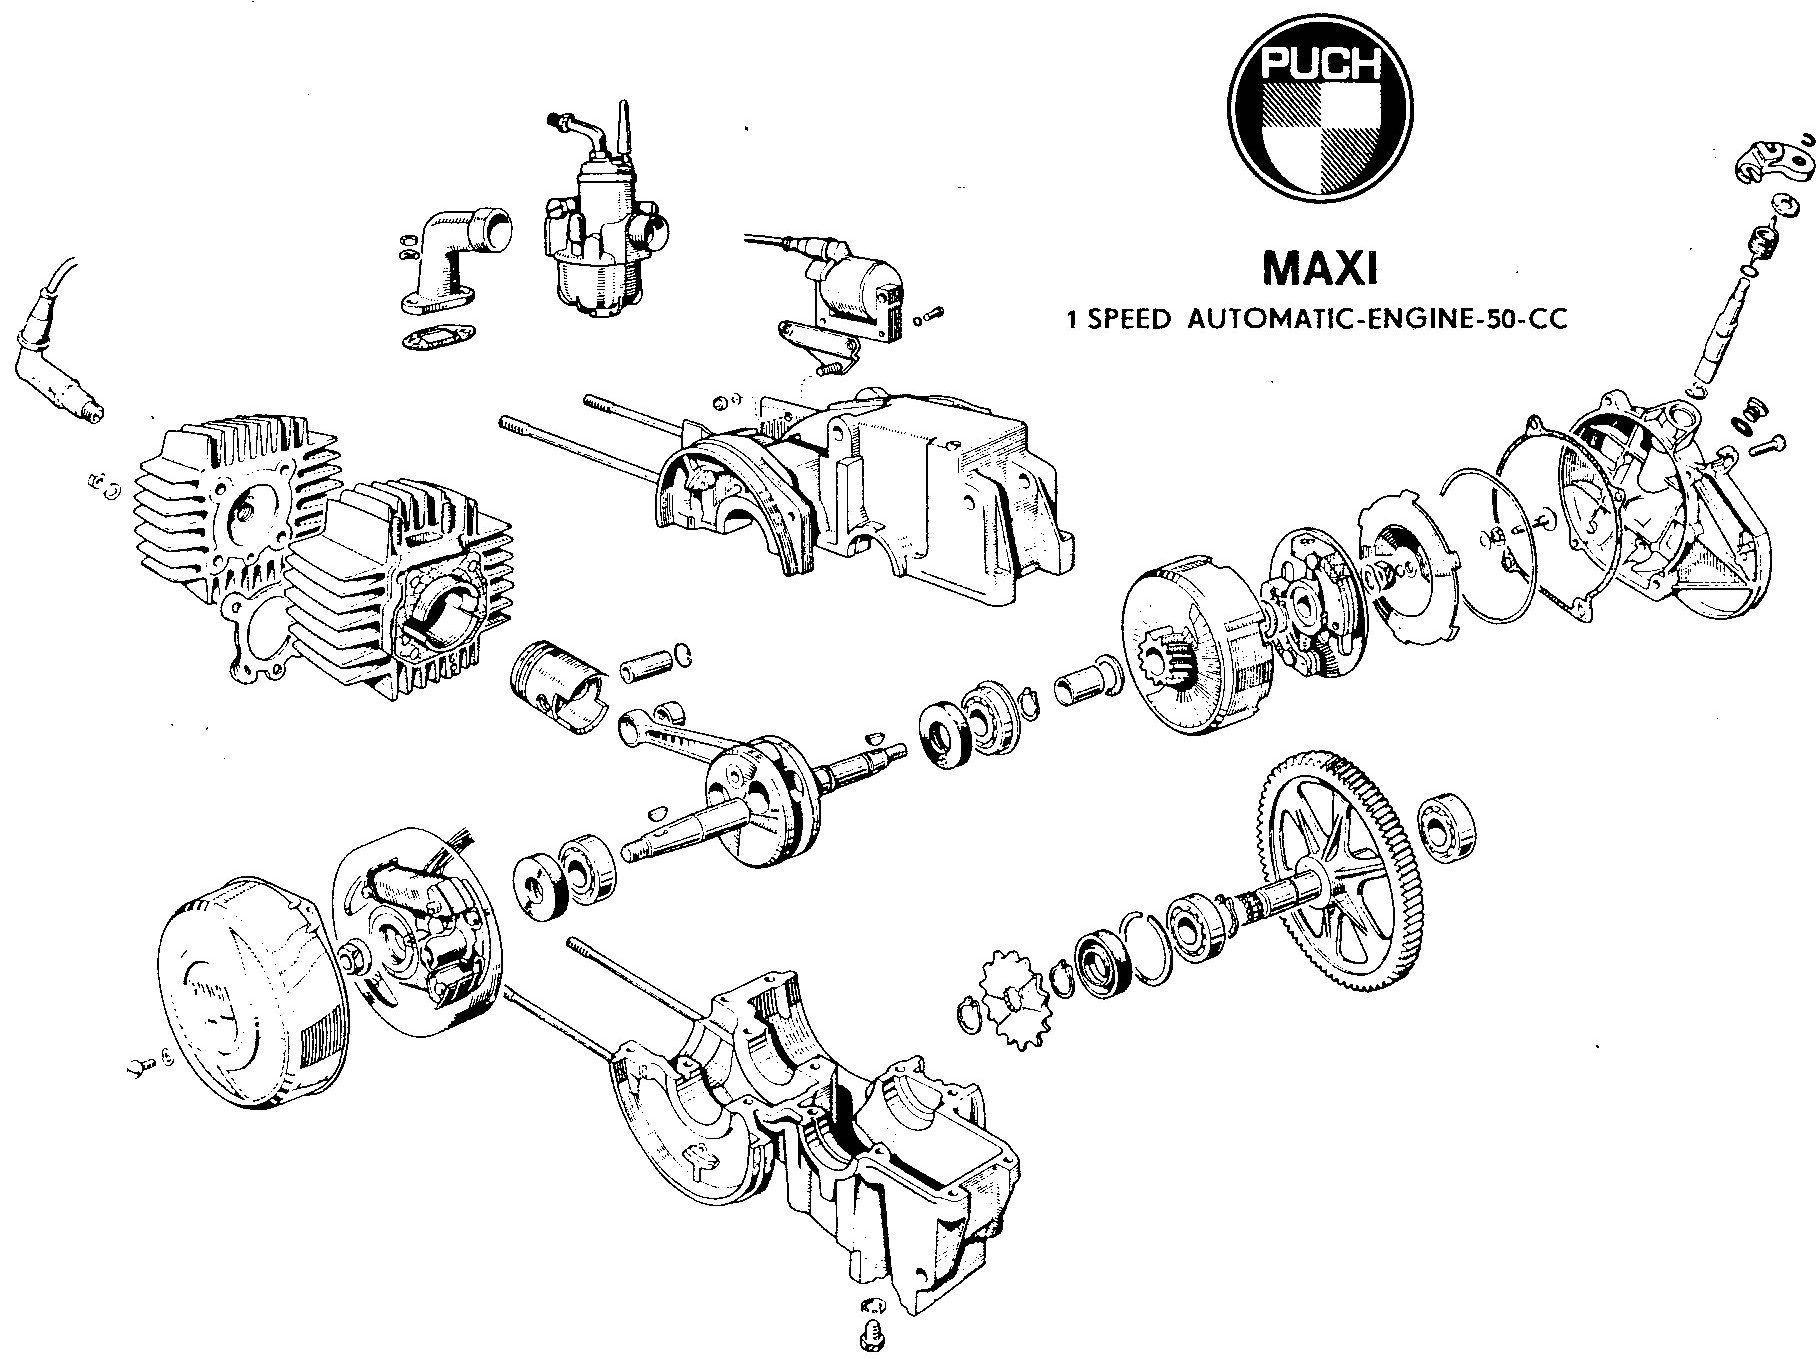 puch e50 engine diagram